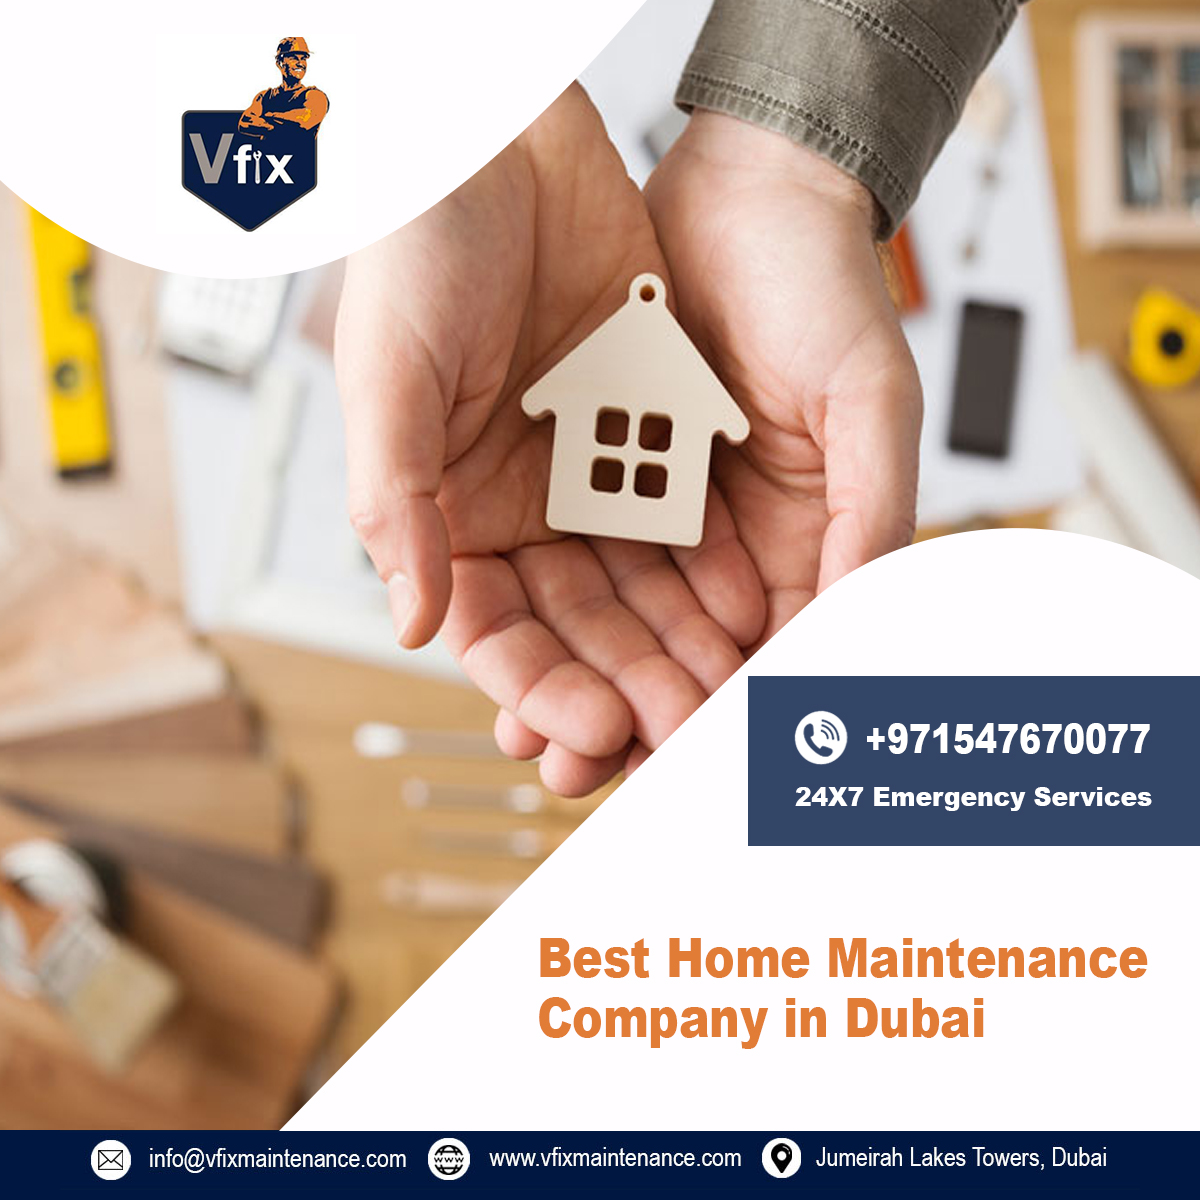 Best Home Maintenance Company in Dubai